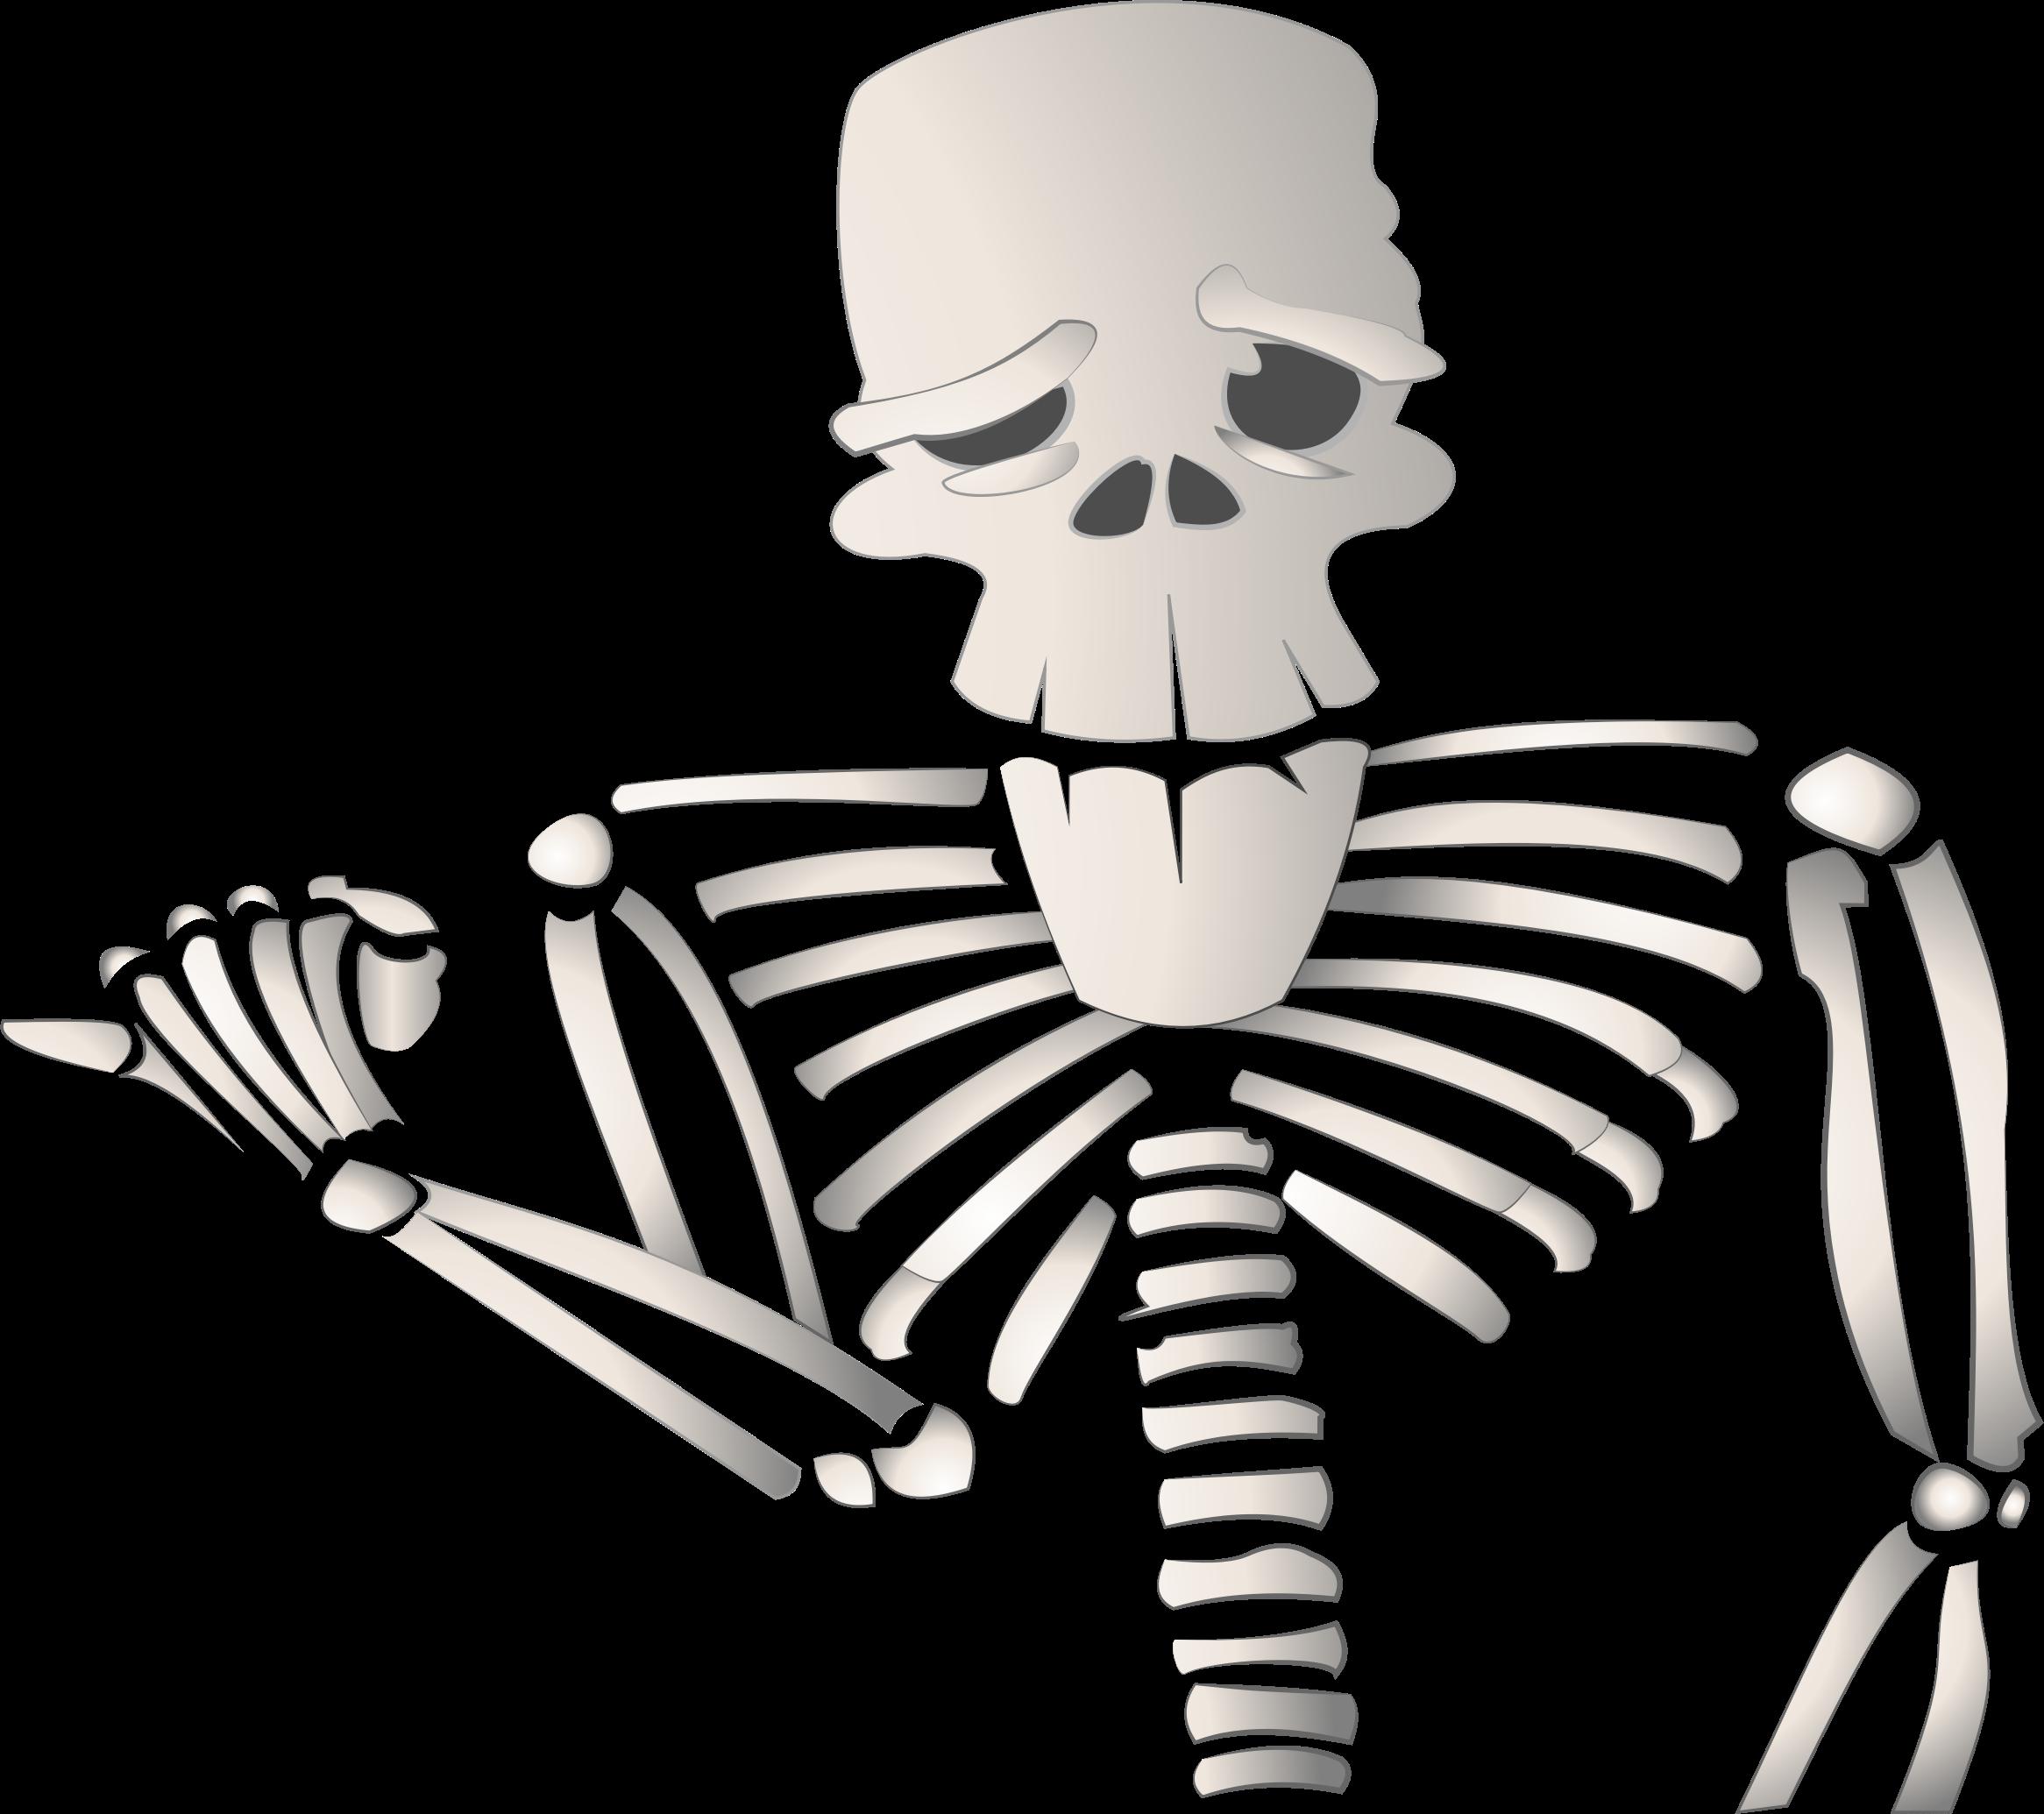 Clipart halloween skeleton. Cartoon big image png